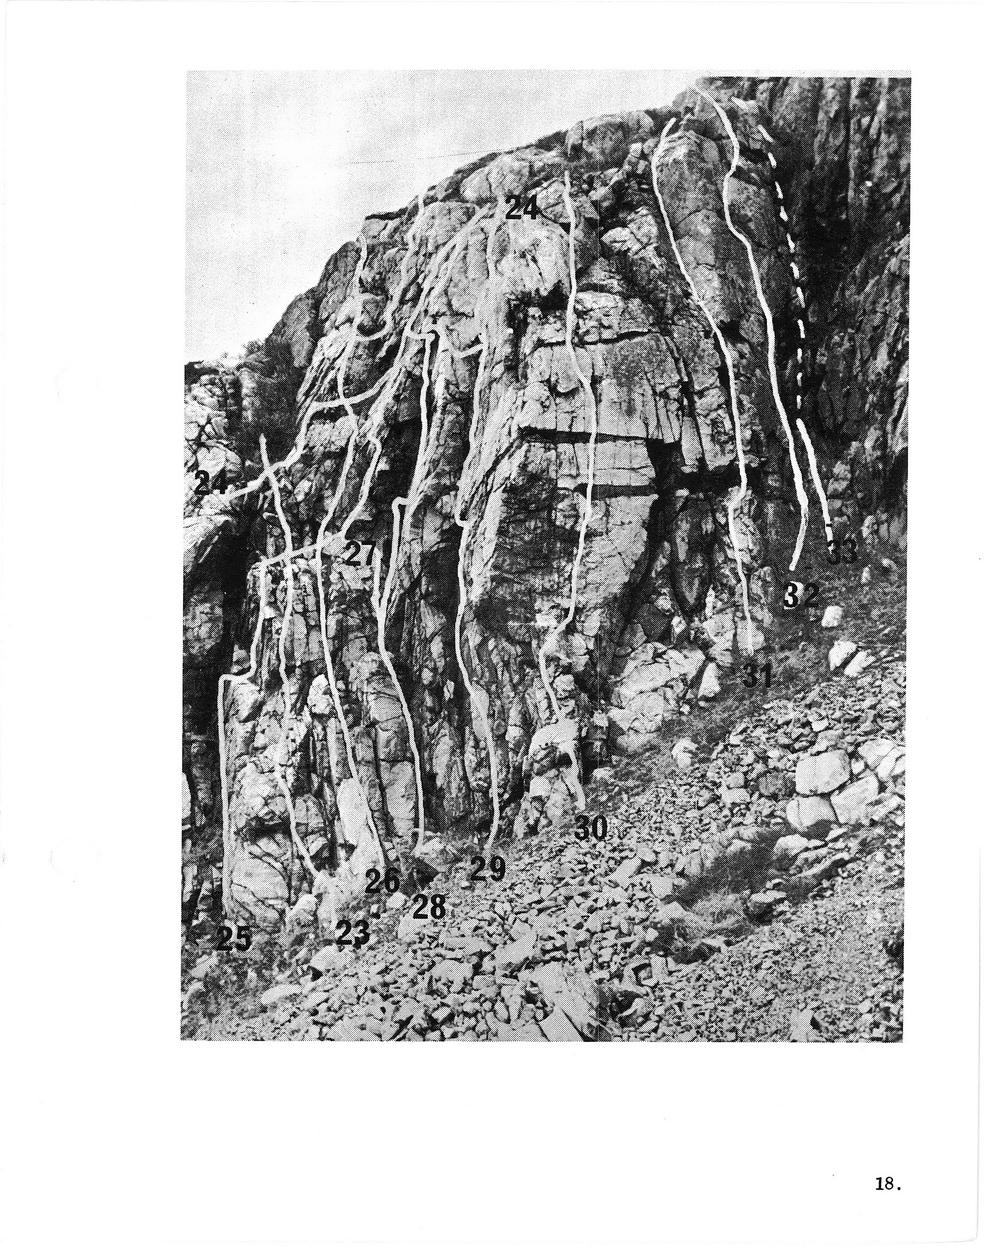 Kullen guide 1972 018.jpg